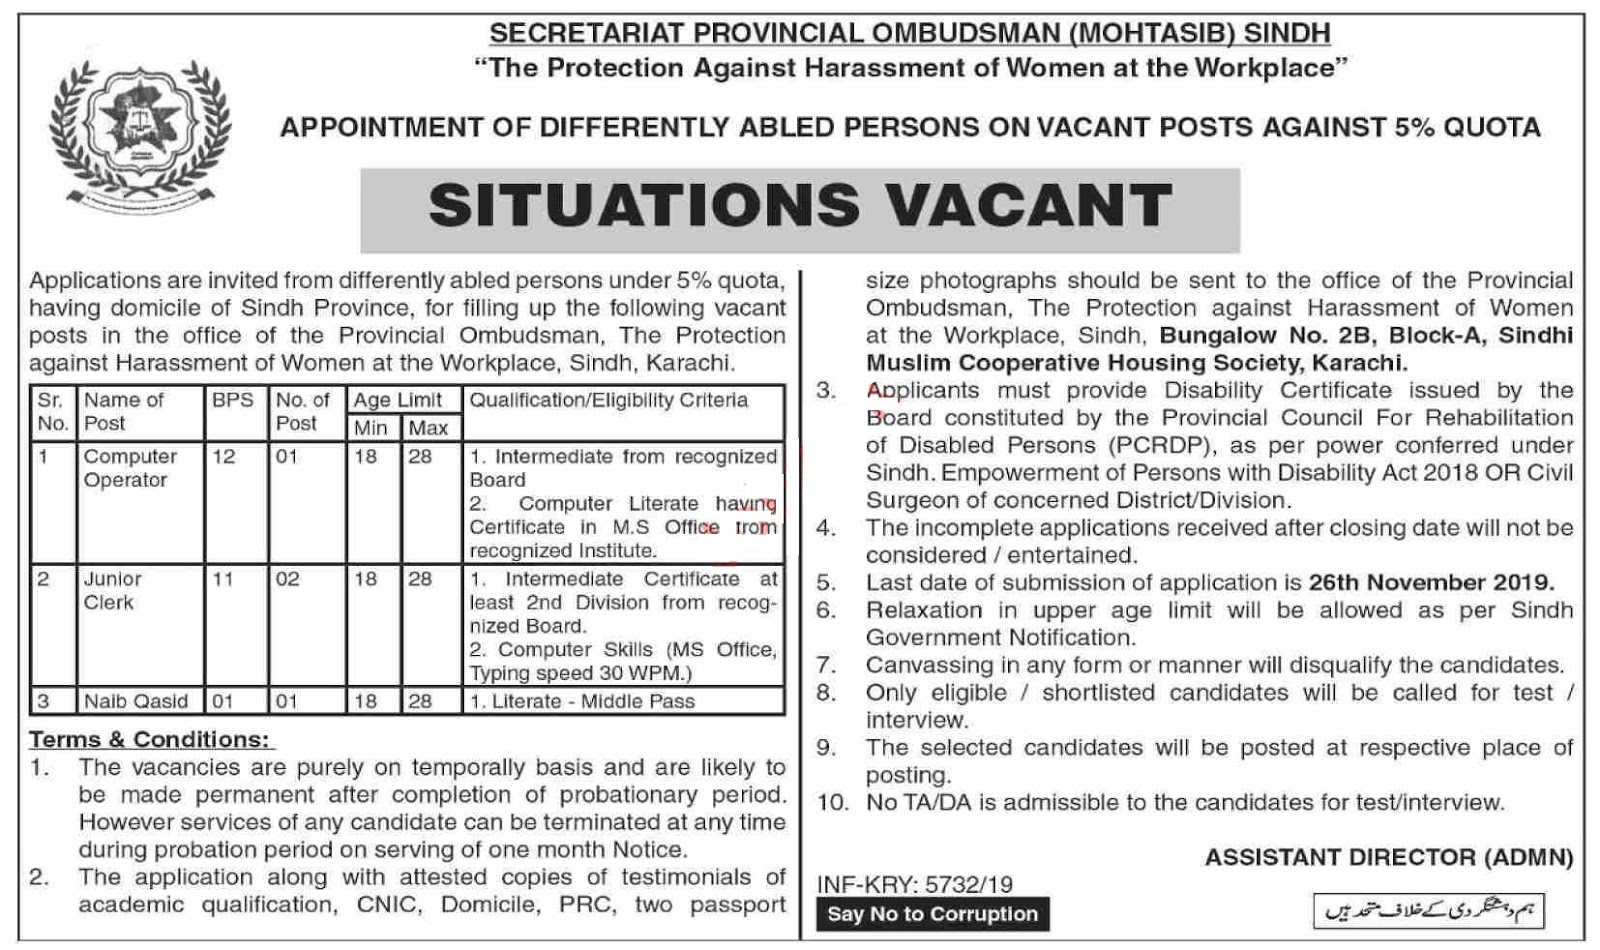 Secretariat Provincial Ombudsman Mohtasib Sindh Clerk Jobs 2019